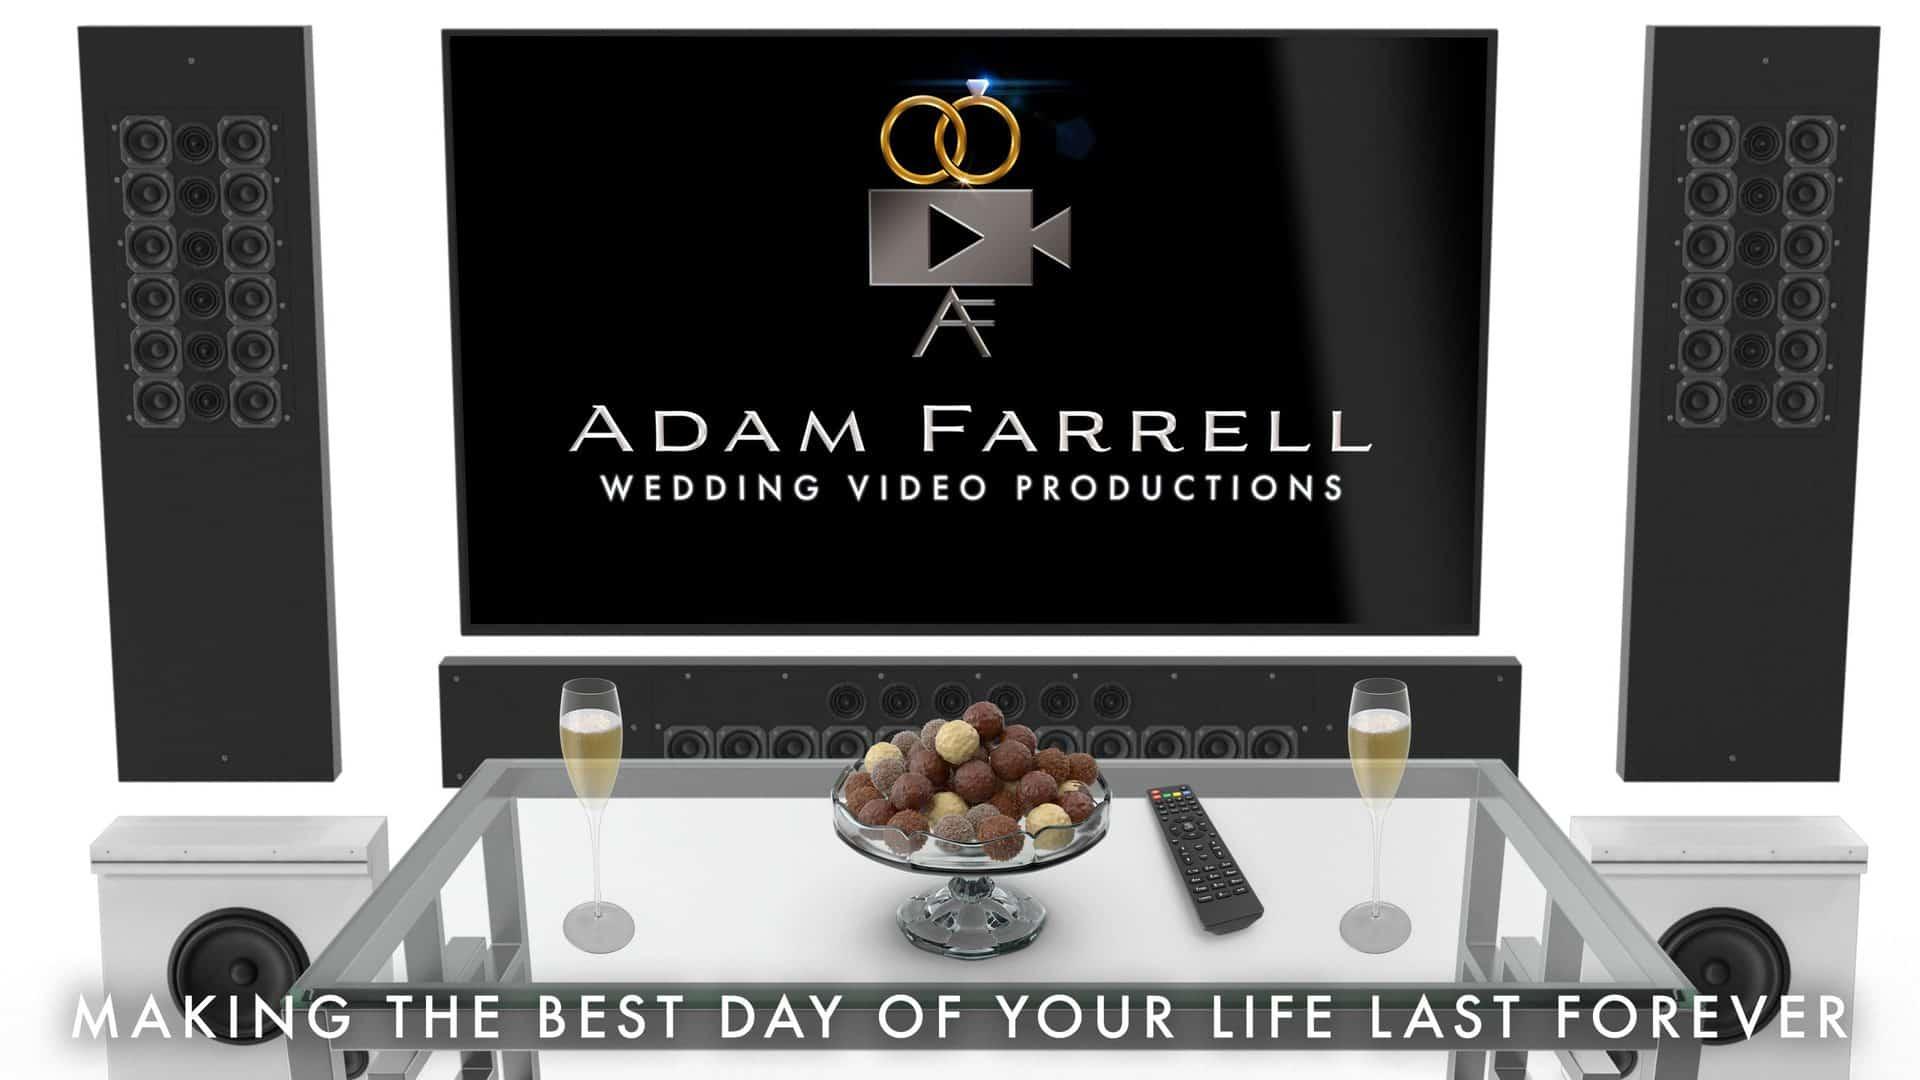 Adam Farrell Work Image 6